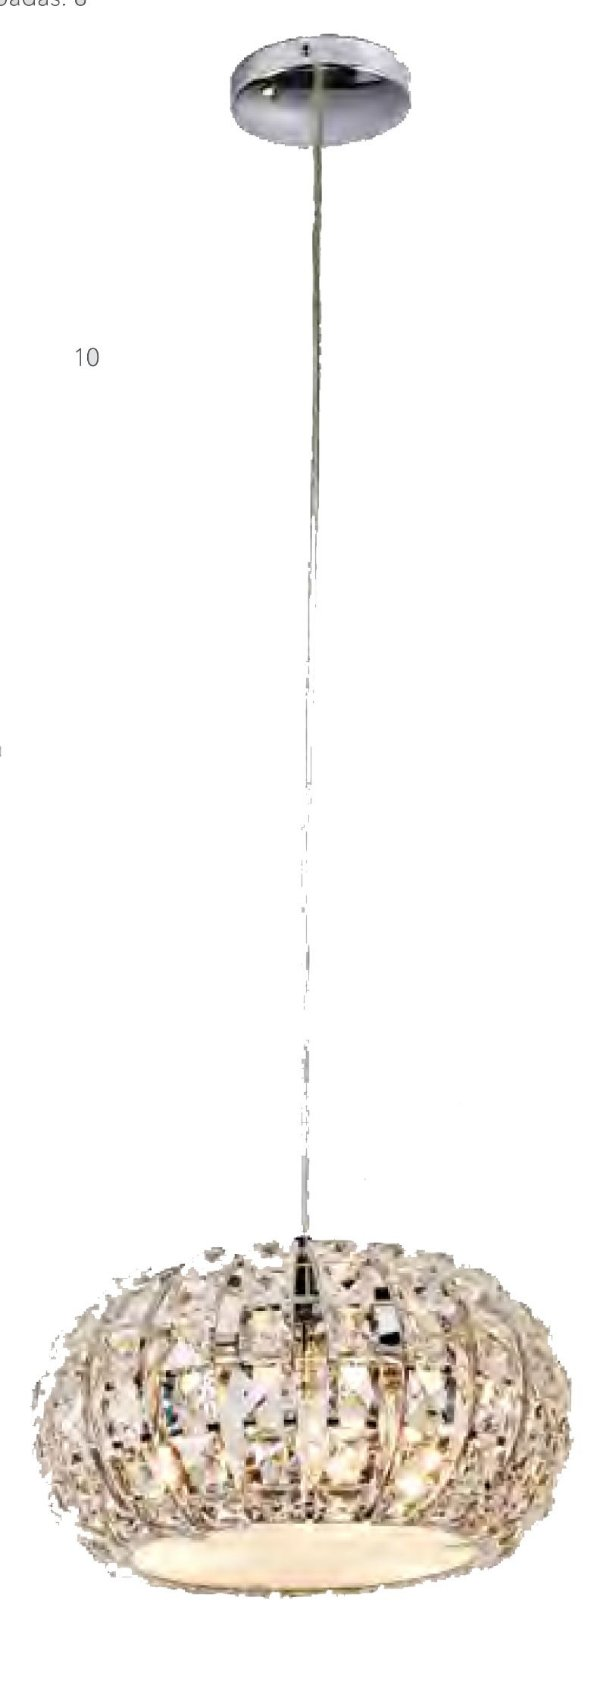 PENDENTE Bella Ilumy HO2024P VIENNA Cristal Lapidado Redondo Cromado Transparente 24CM 3XG9